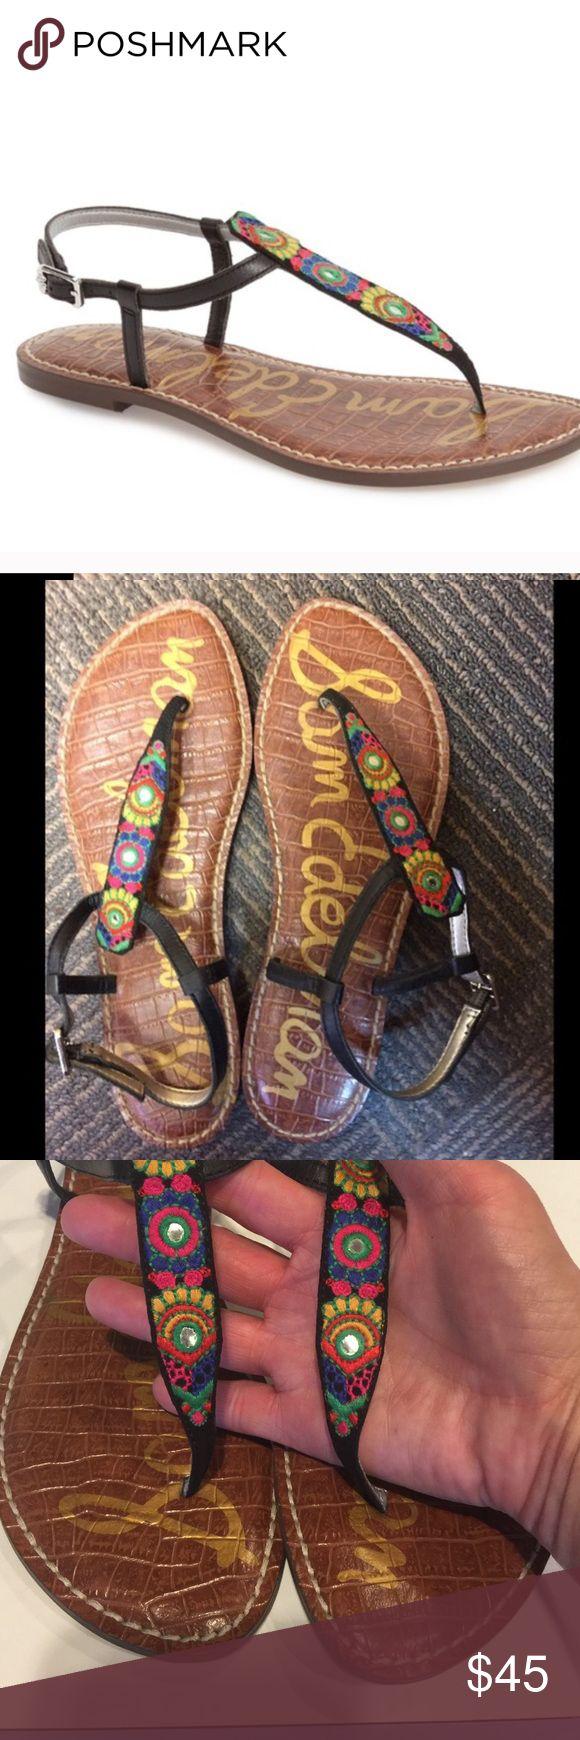 NEW Sam Edelman Gigi Sandals Bombay Print Size 9 NEW Sam Edelman Gigi Sandals Bombay Print Size 9. Adorable and comfortable! Sam Edelman Shoes Sandals